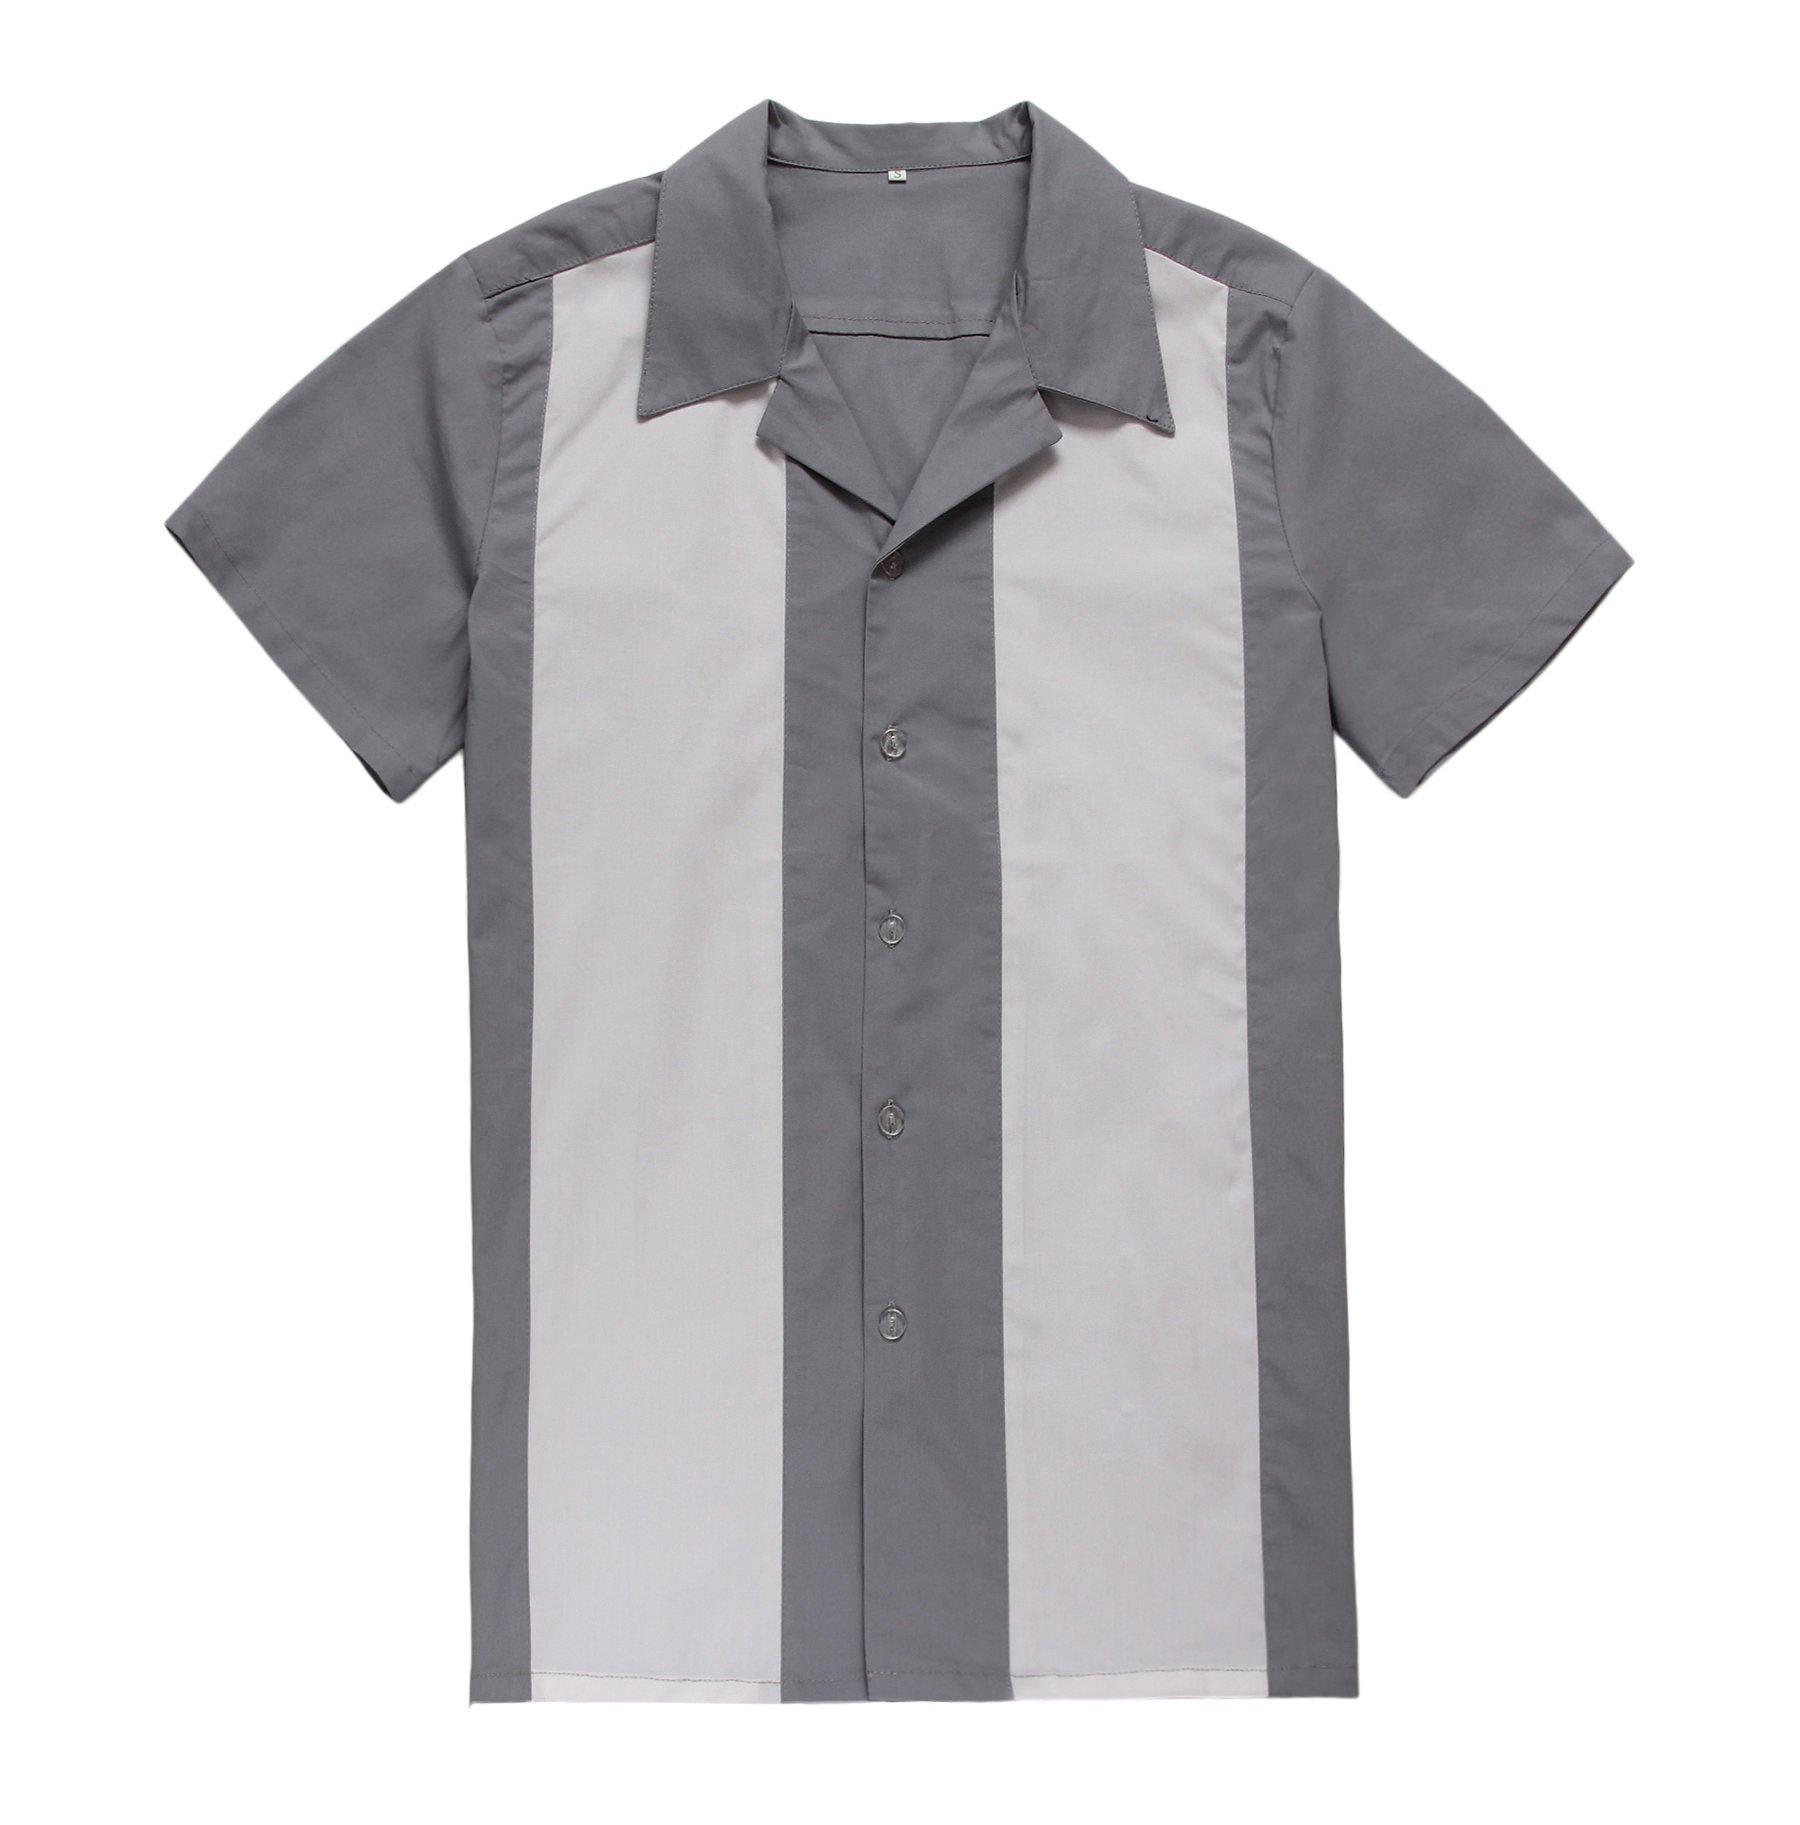 Candow Look American Vintage Casual Designs Online Shopping Men